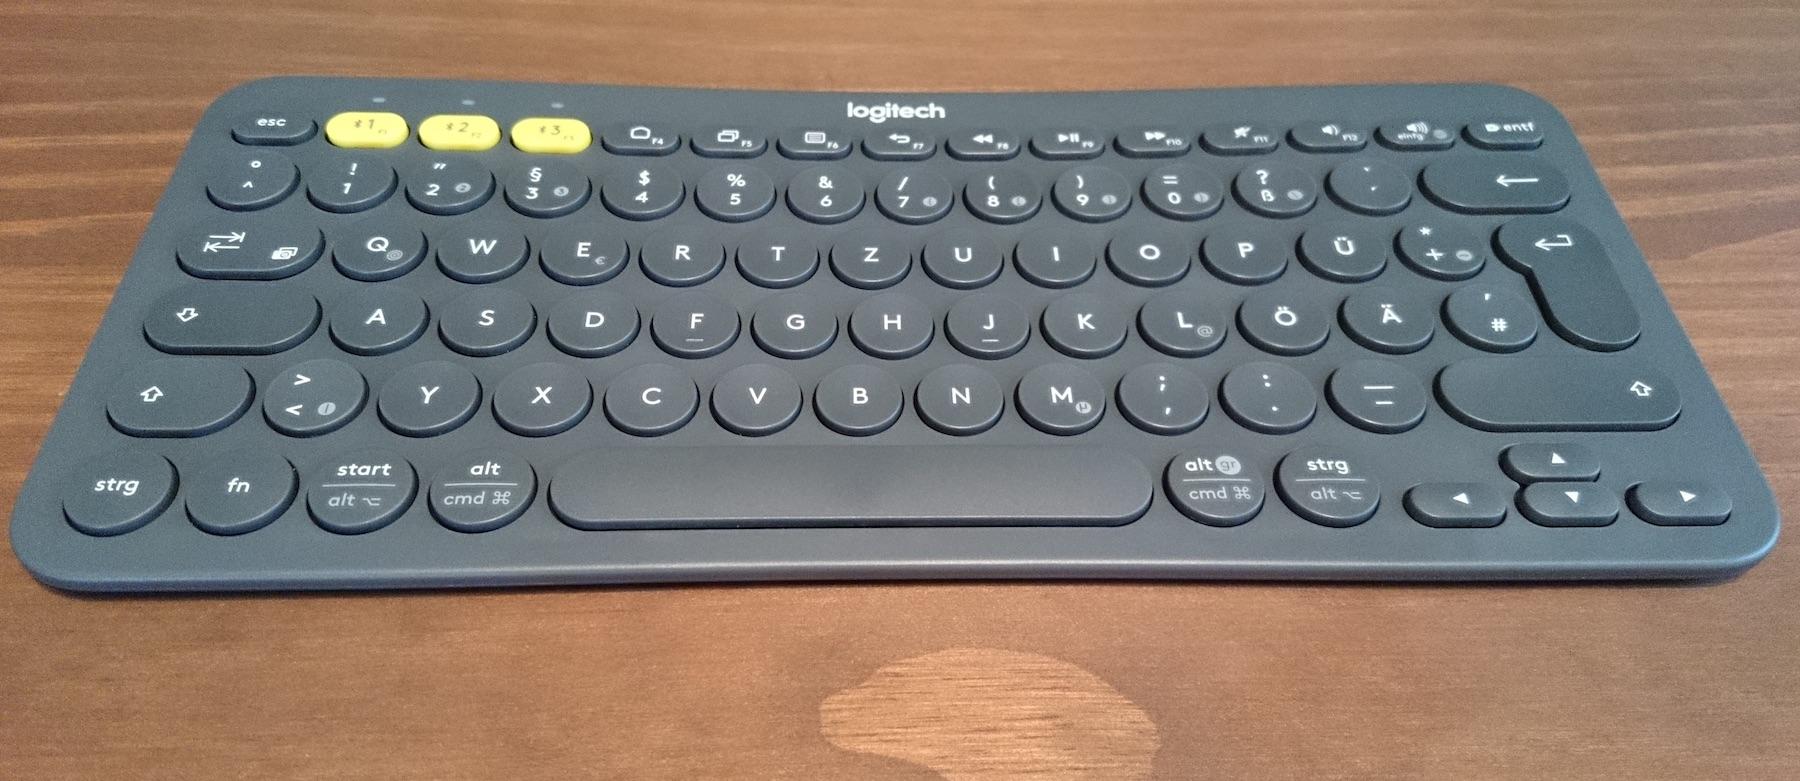 Logitech K380 Testbericht